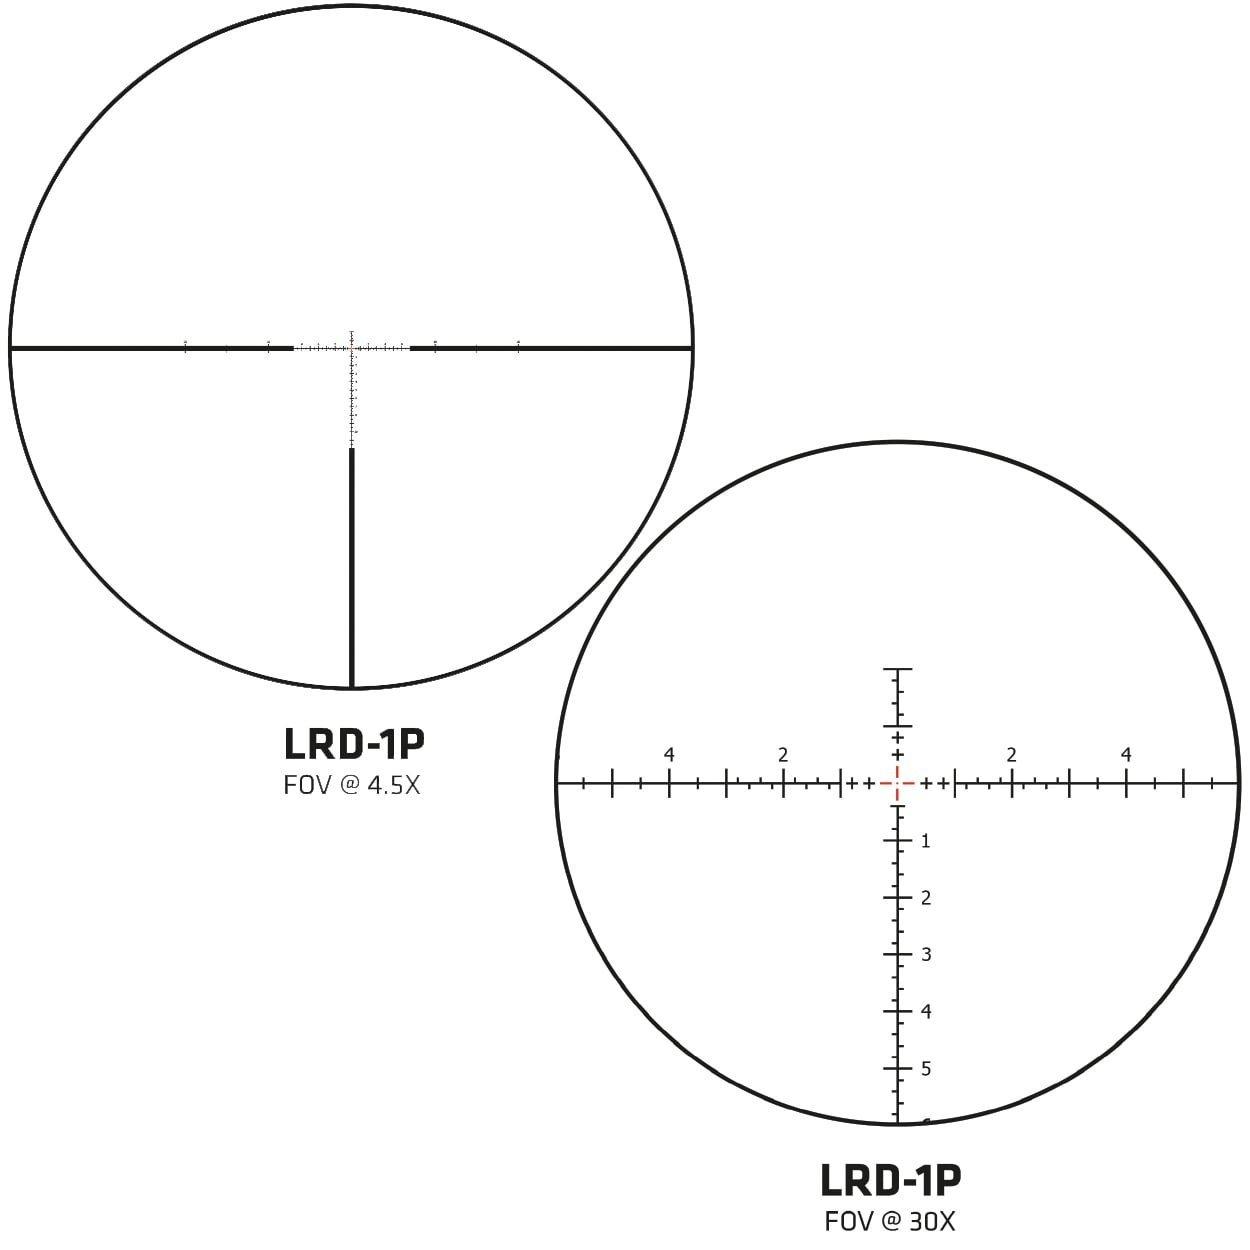 LRD-1P